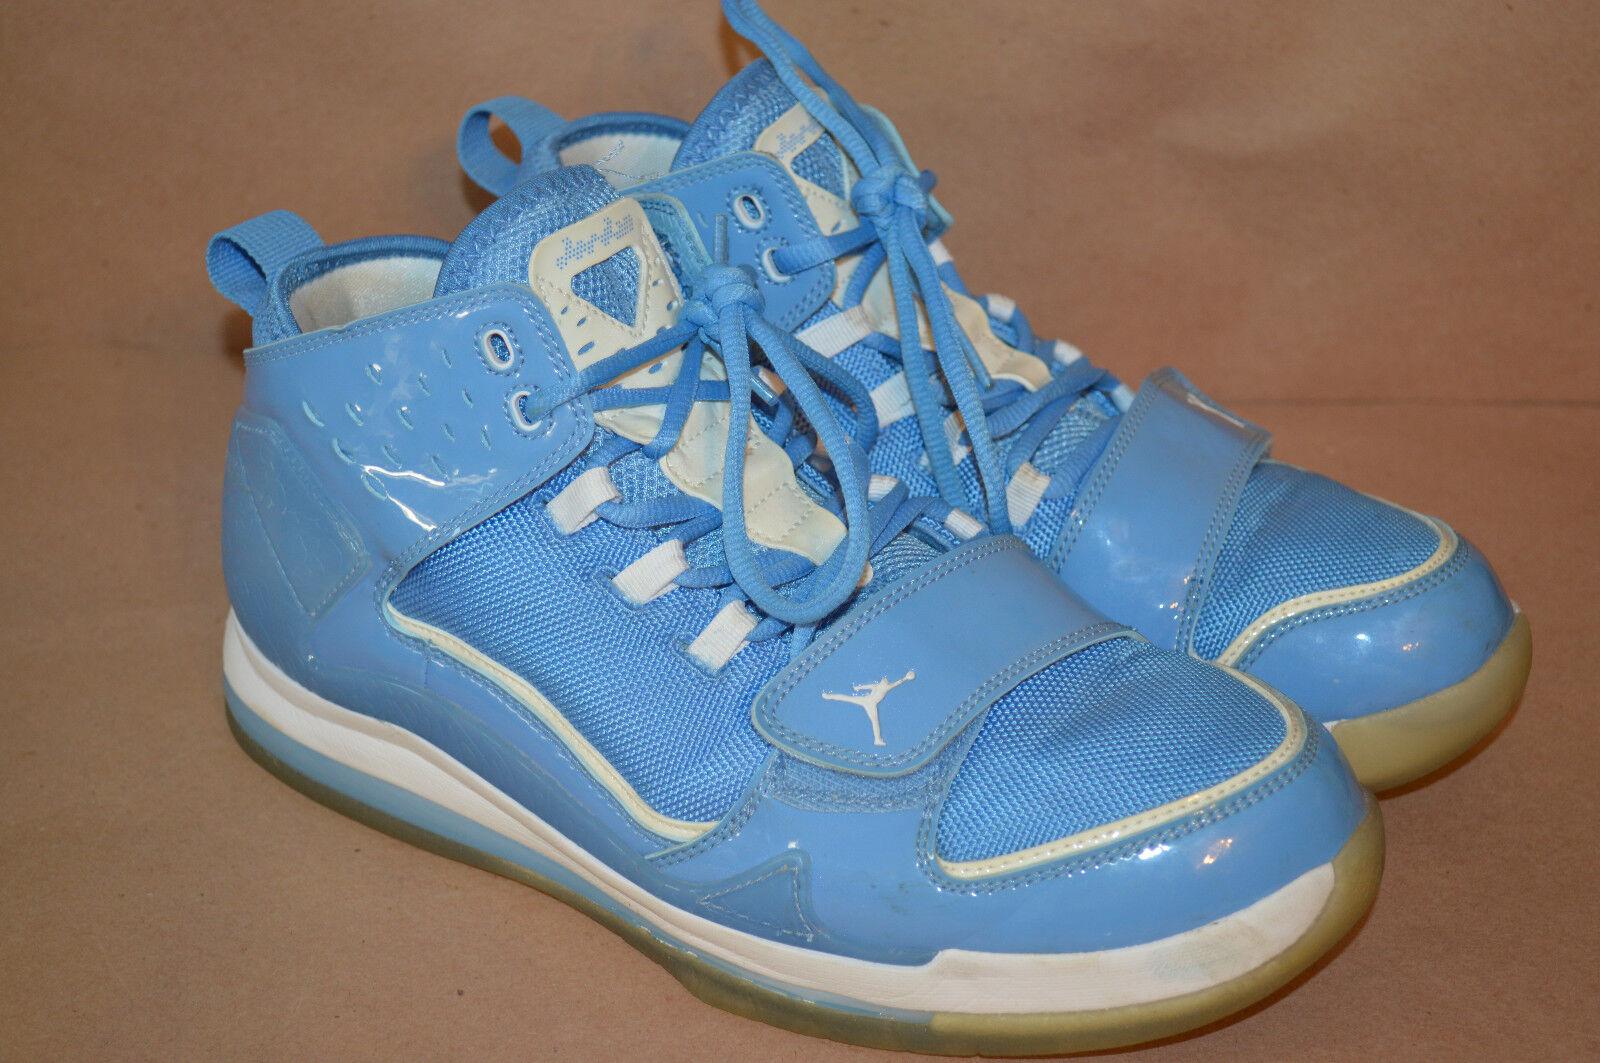 NIKE AIR EVOLUTION BASKETBALL SHOE JORDAN WHITE blueE TRAINING 429493-402 SZ 9.5